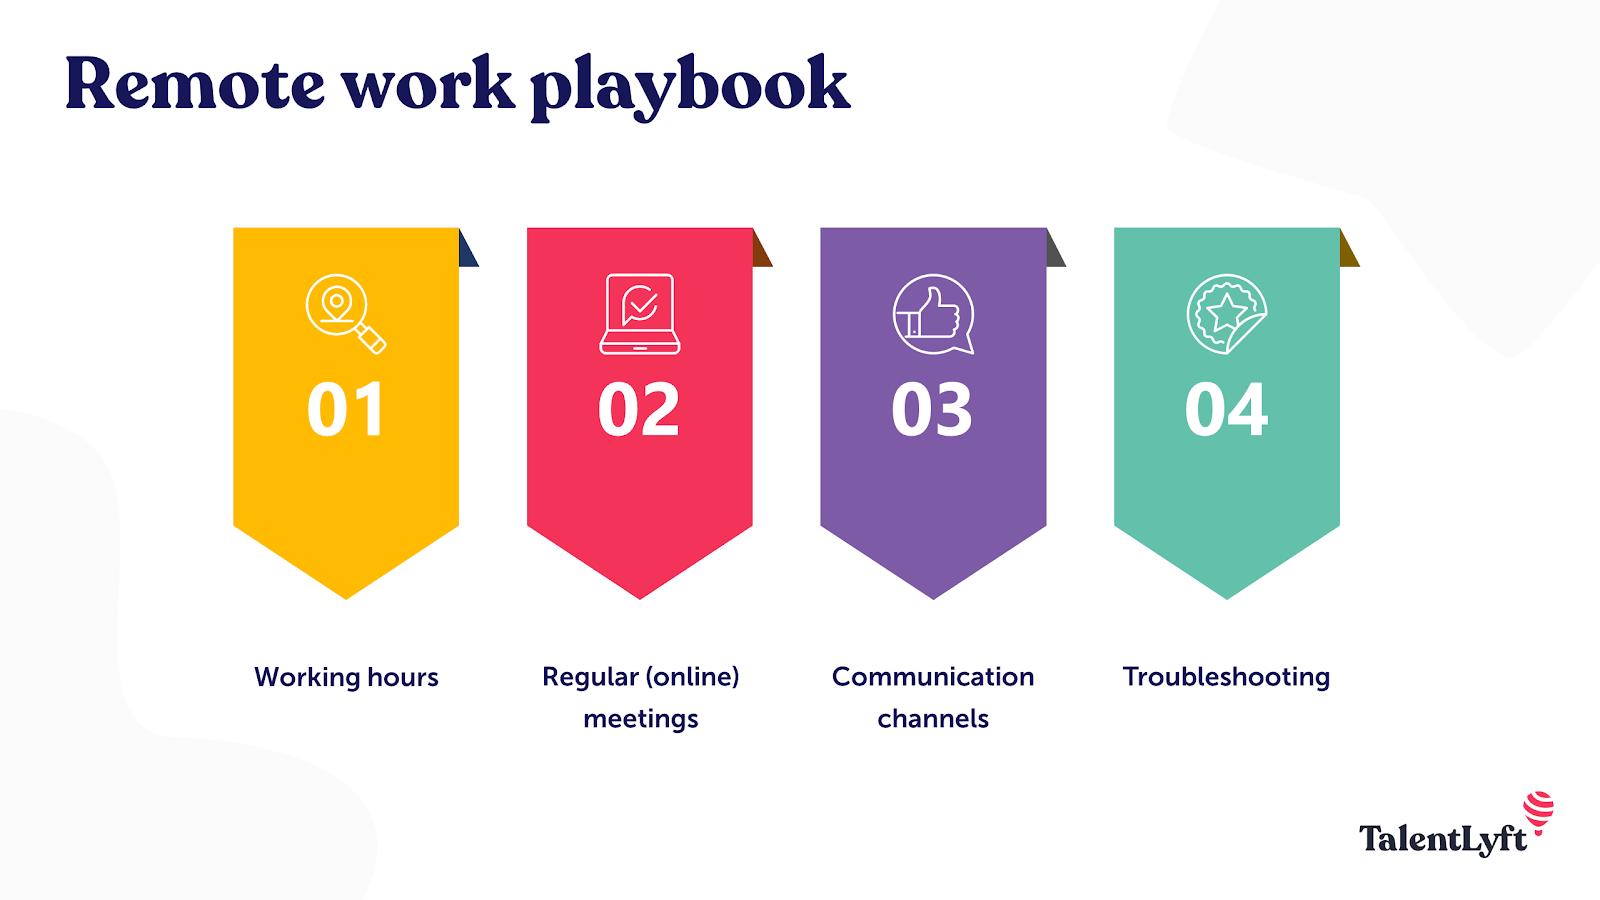 Remote work playbook